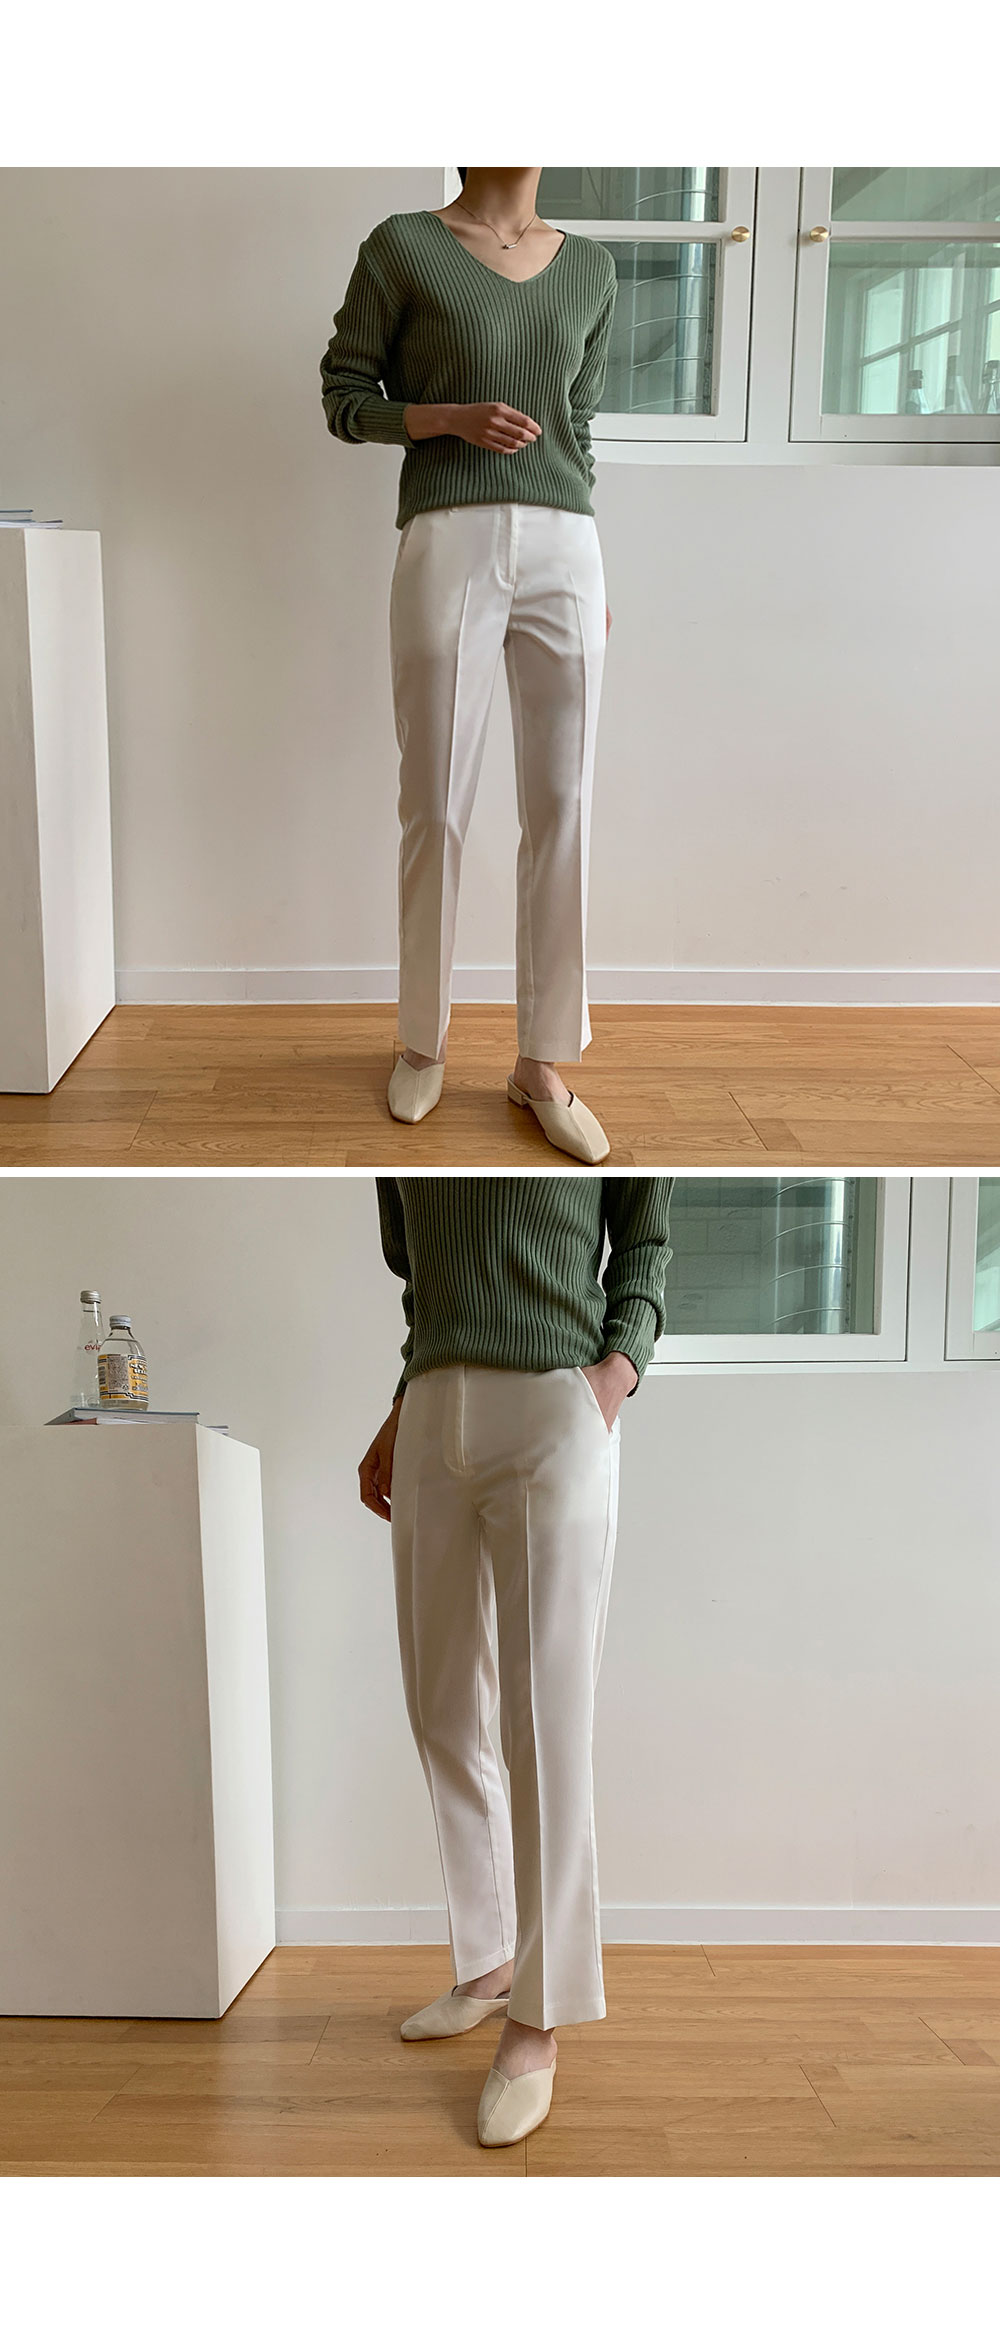 Straight Fit Slim Slacks  -holiholic.com